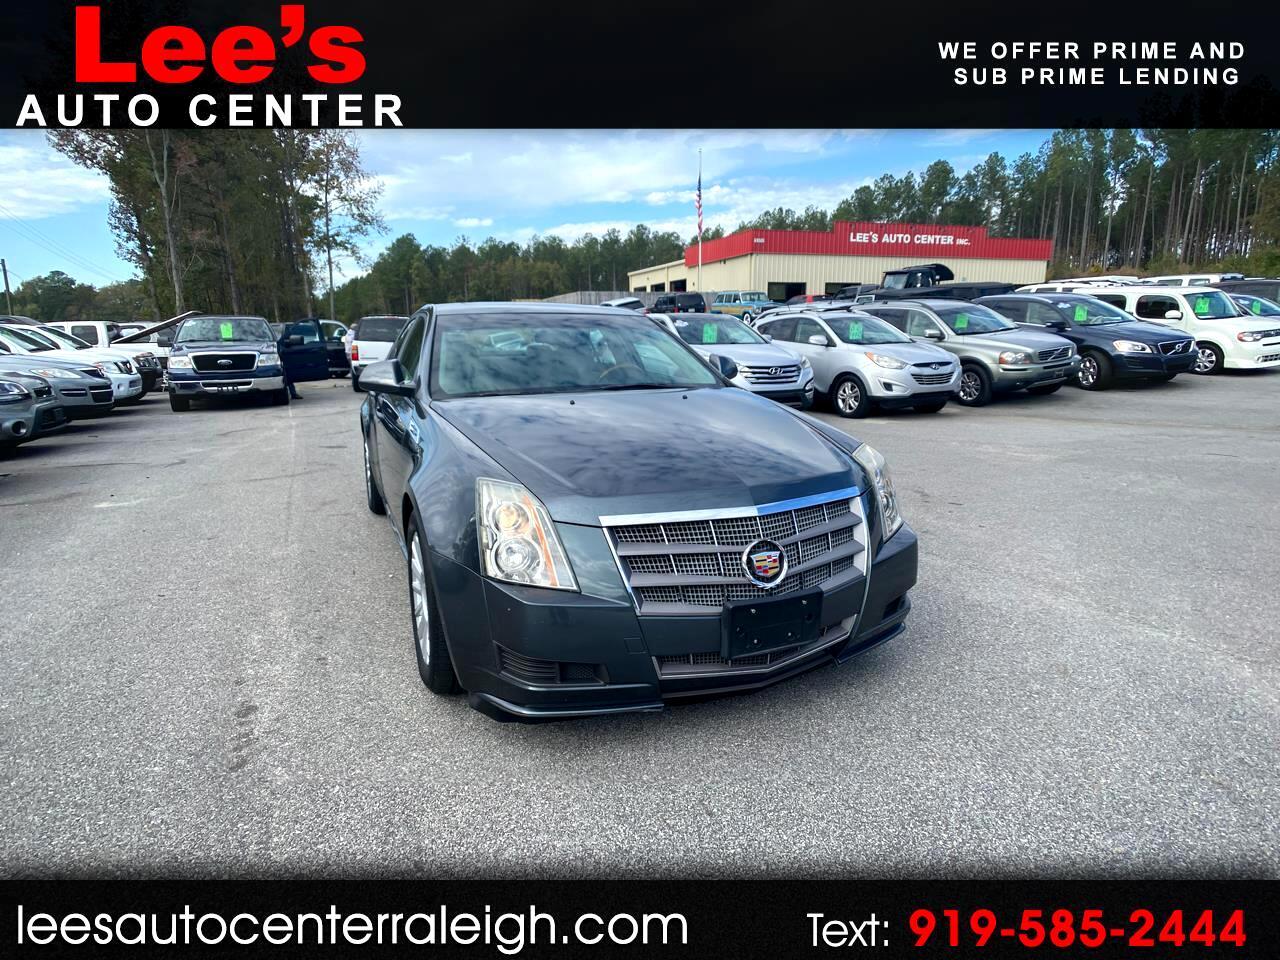 2010 Cadillac CTS Sedan 4dr Sdn 3.0L Luxury AWD